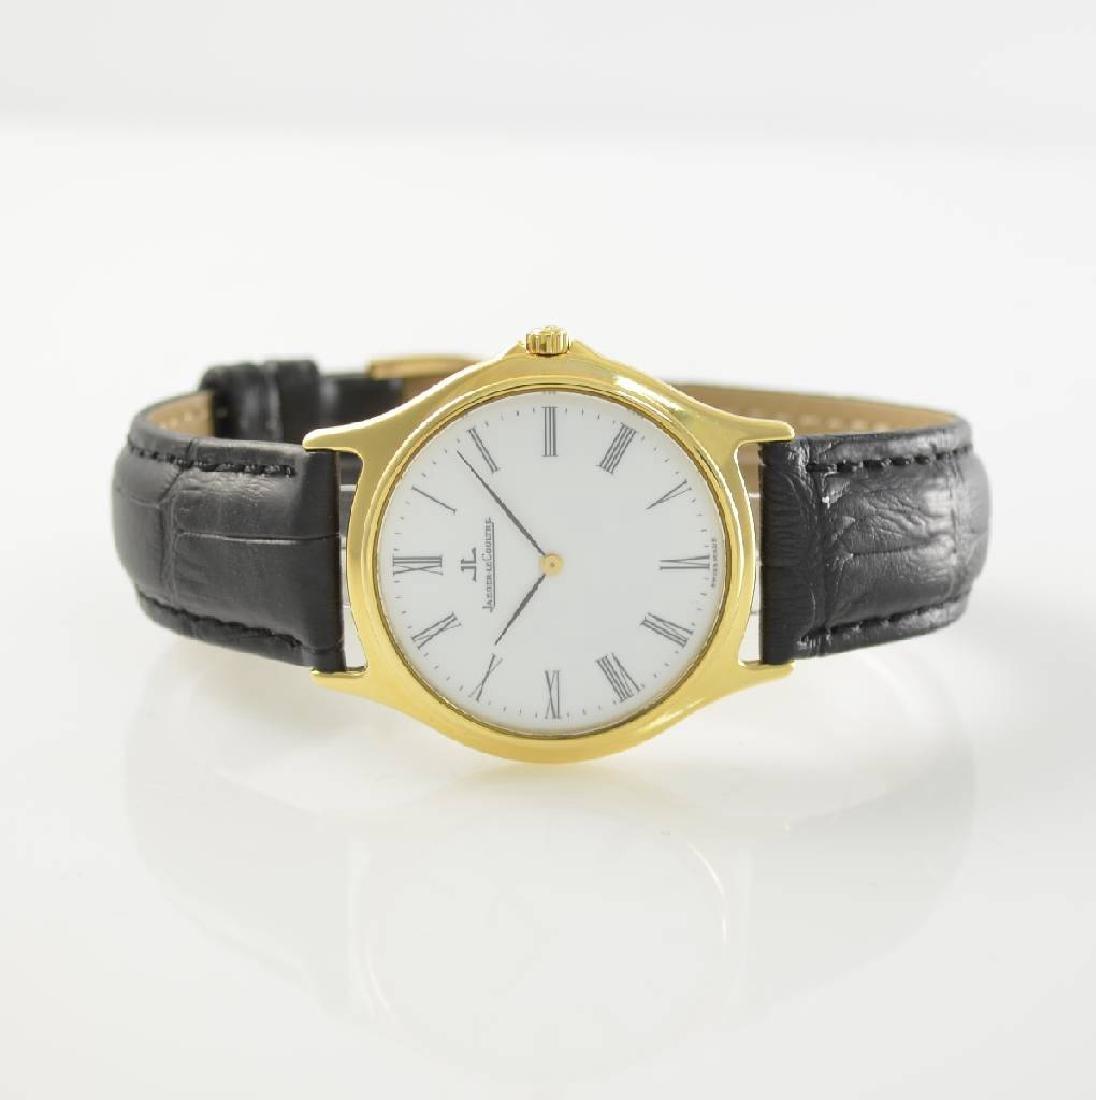 Jaeger-LeCoultre 18k yellow gold gents wristwatch